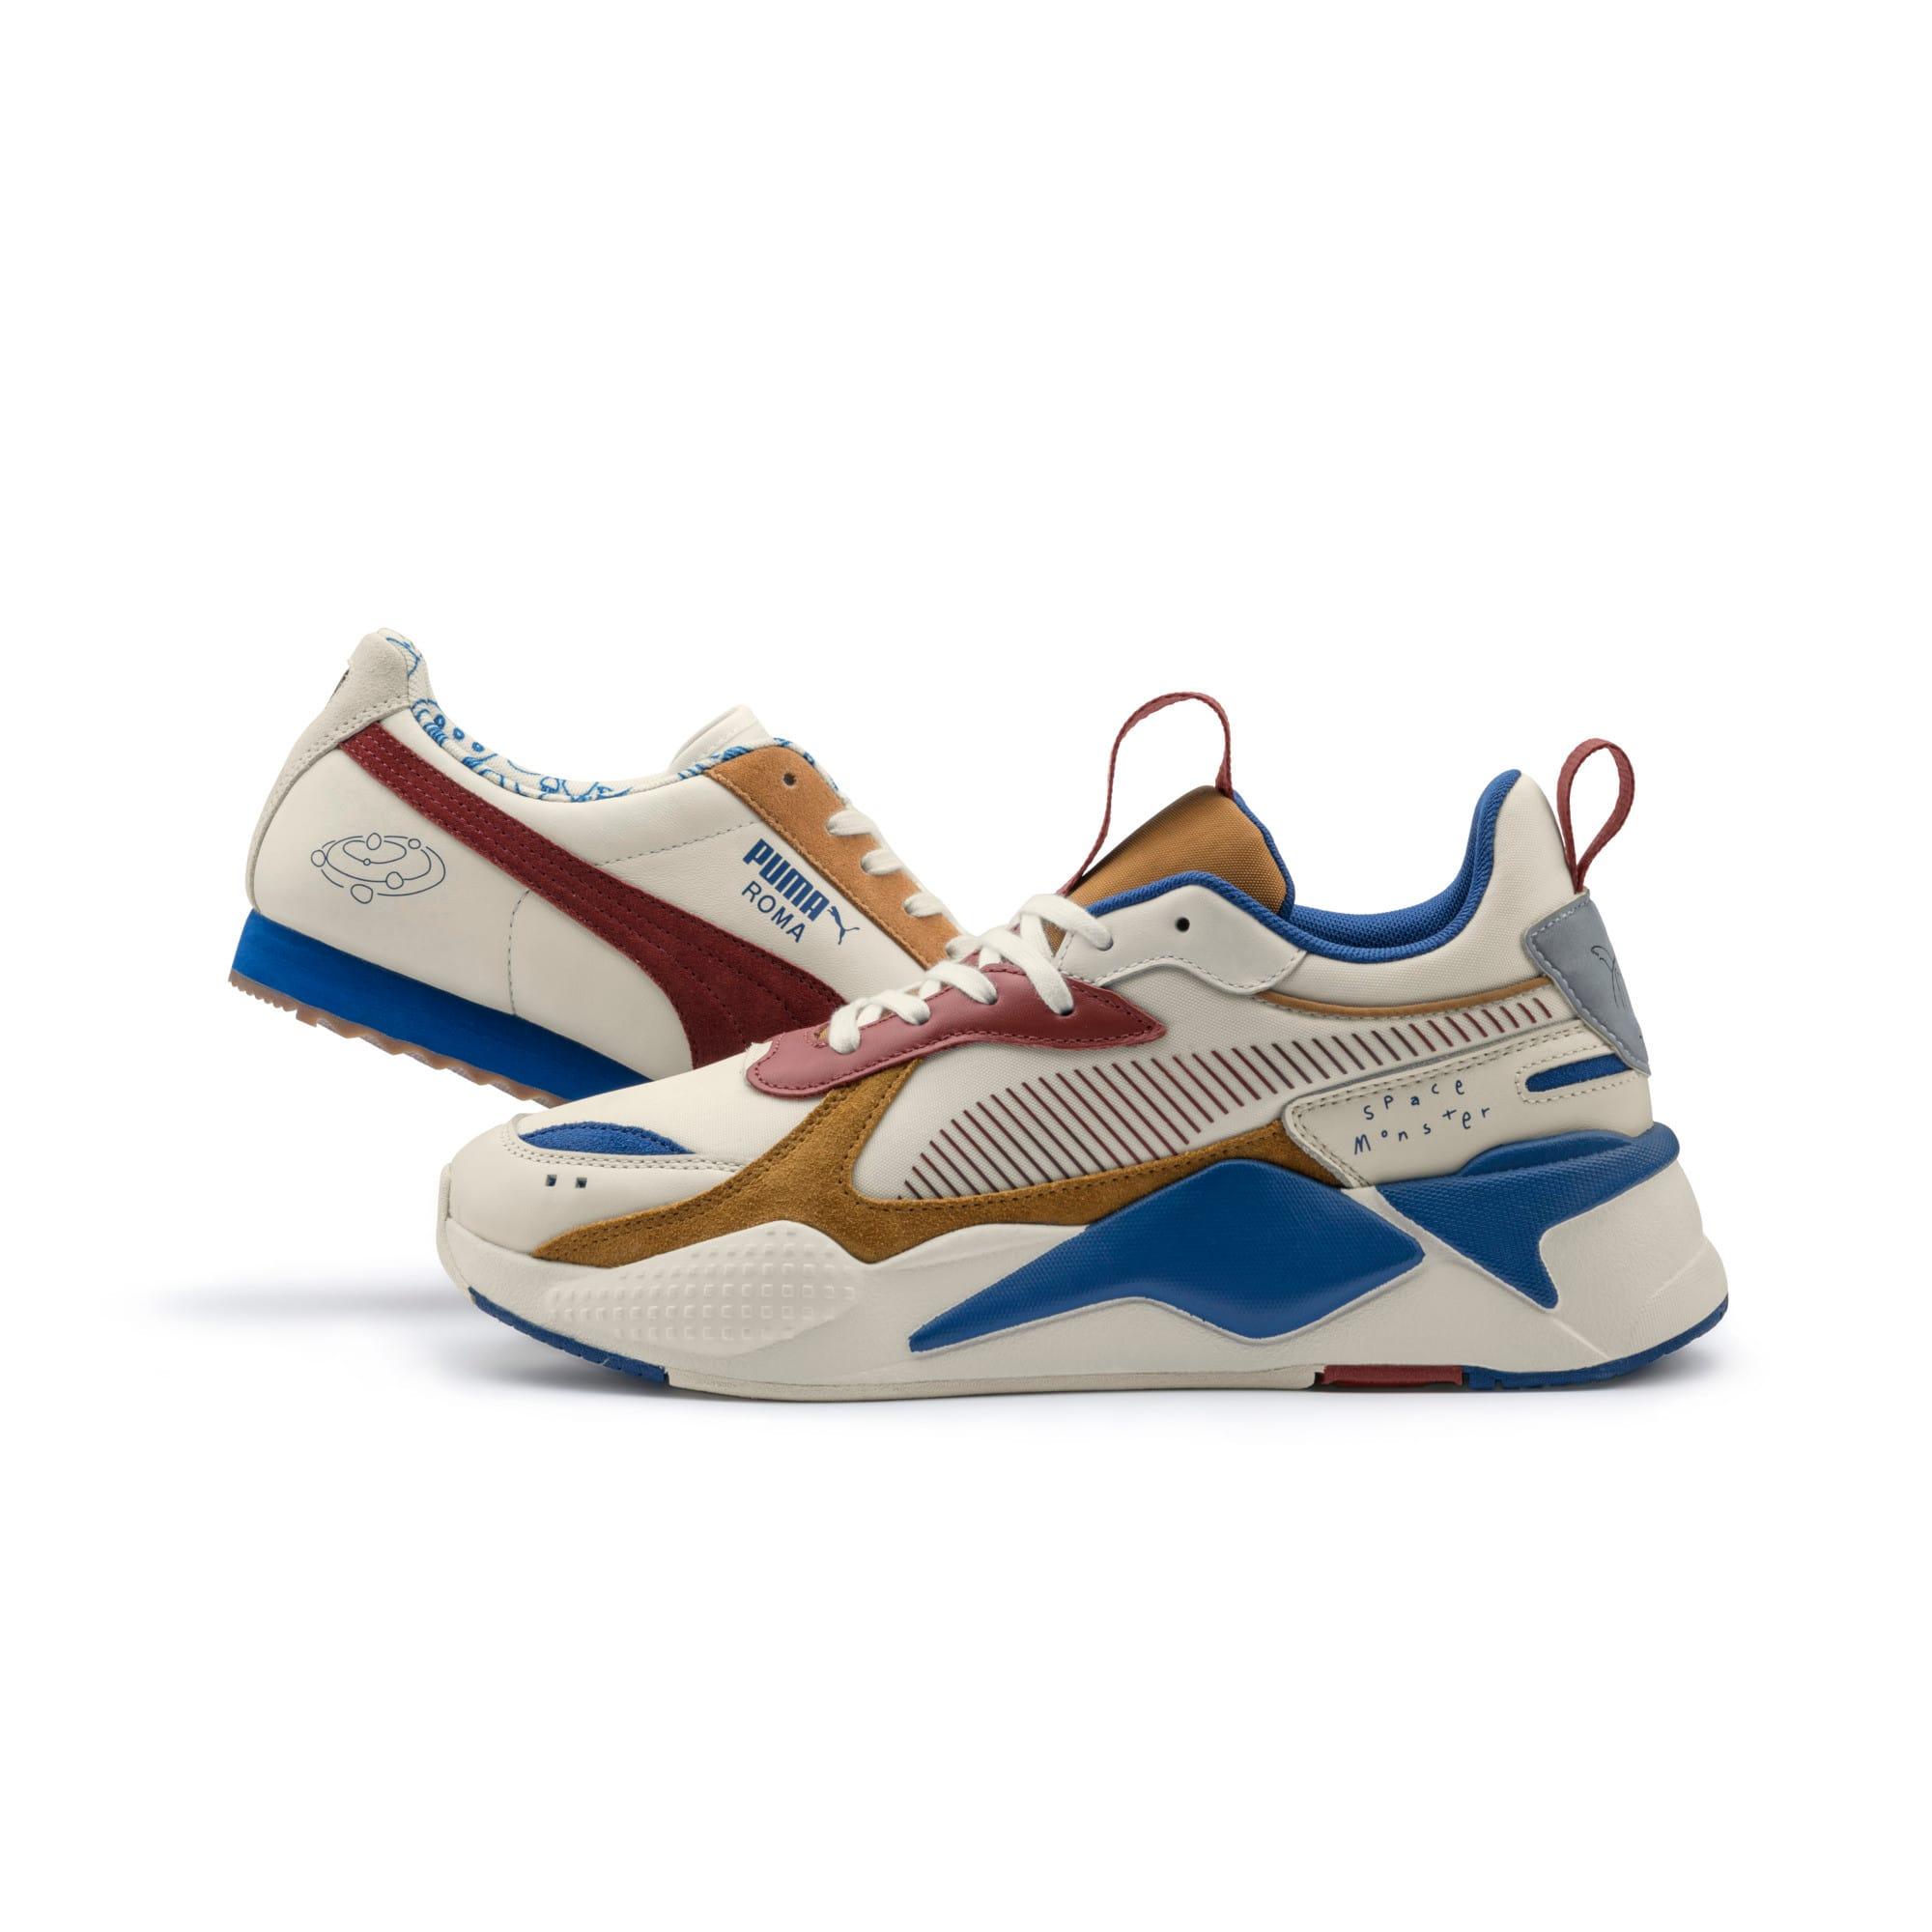 Miniatura 9 de Zapatos deportivos PUMA x TYAKASHA RS-X, Whisper White-Fired Brick, mediano